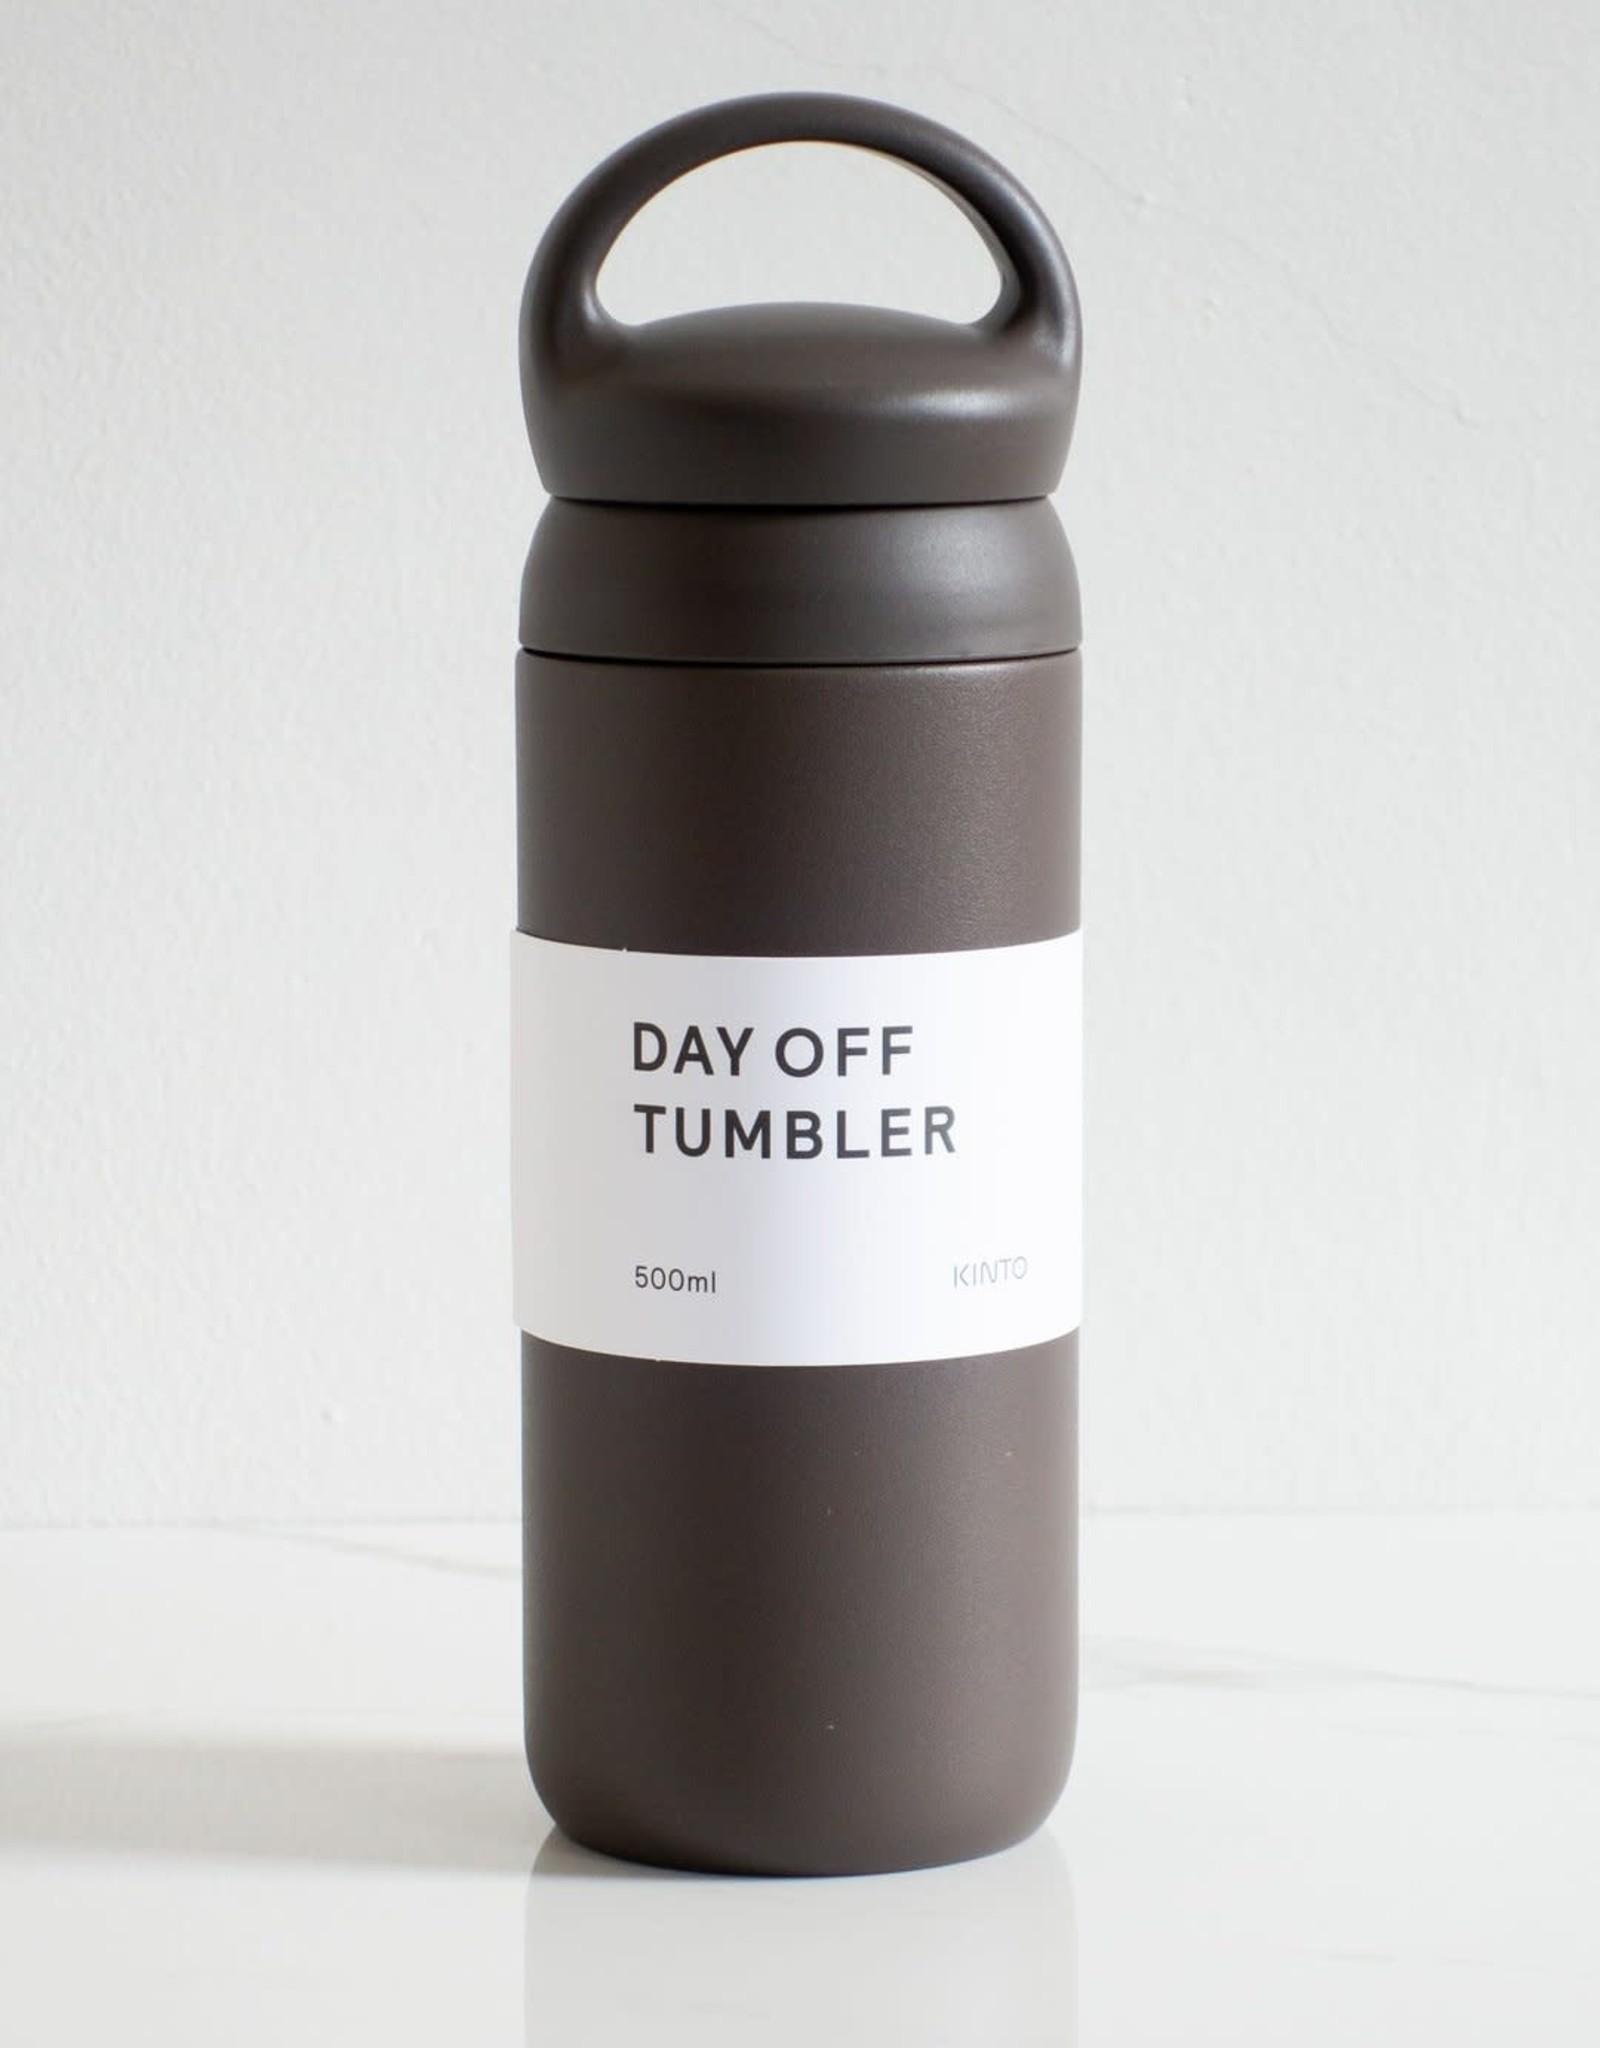 Kinto Day Off Tumbler 500ml - Dark Grey